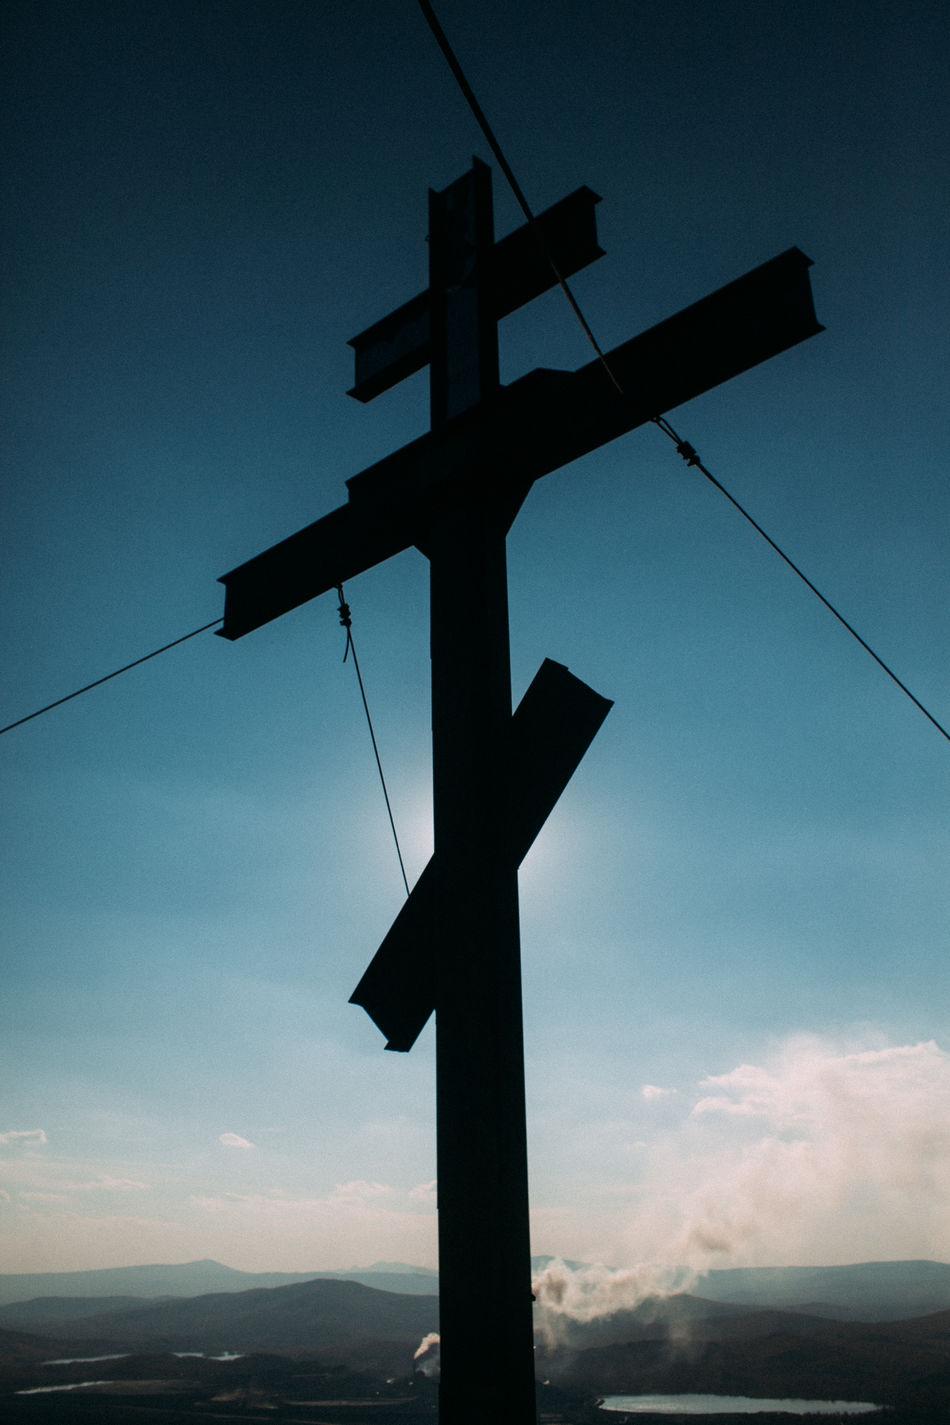 Cross Day Karabash No People Outdoors Religion Russia Sky Sun